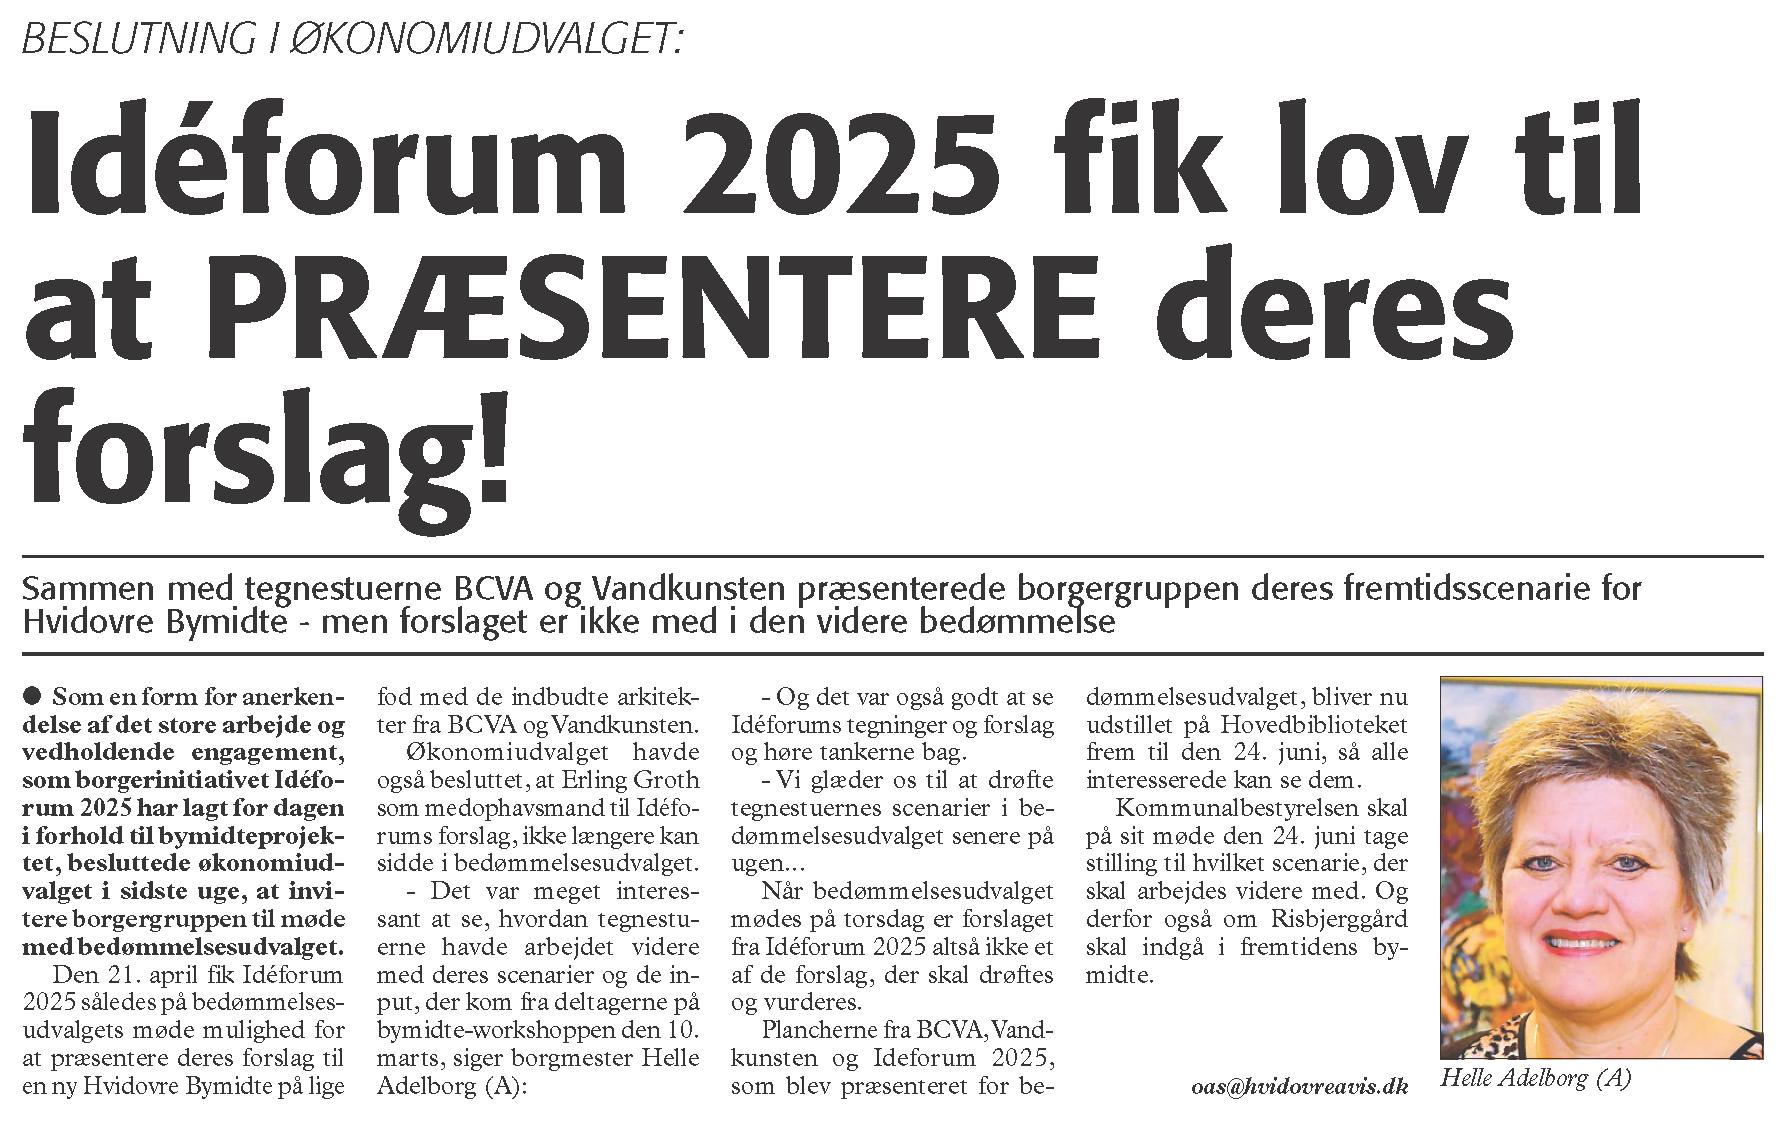 hvidovre avis 28-4-2015 crop